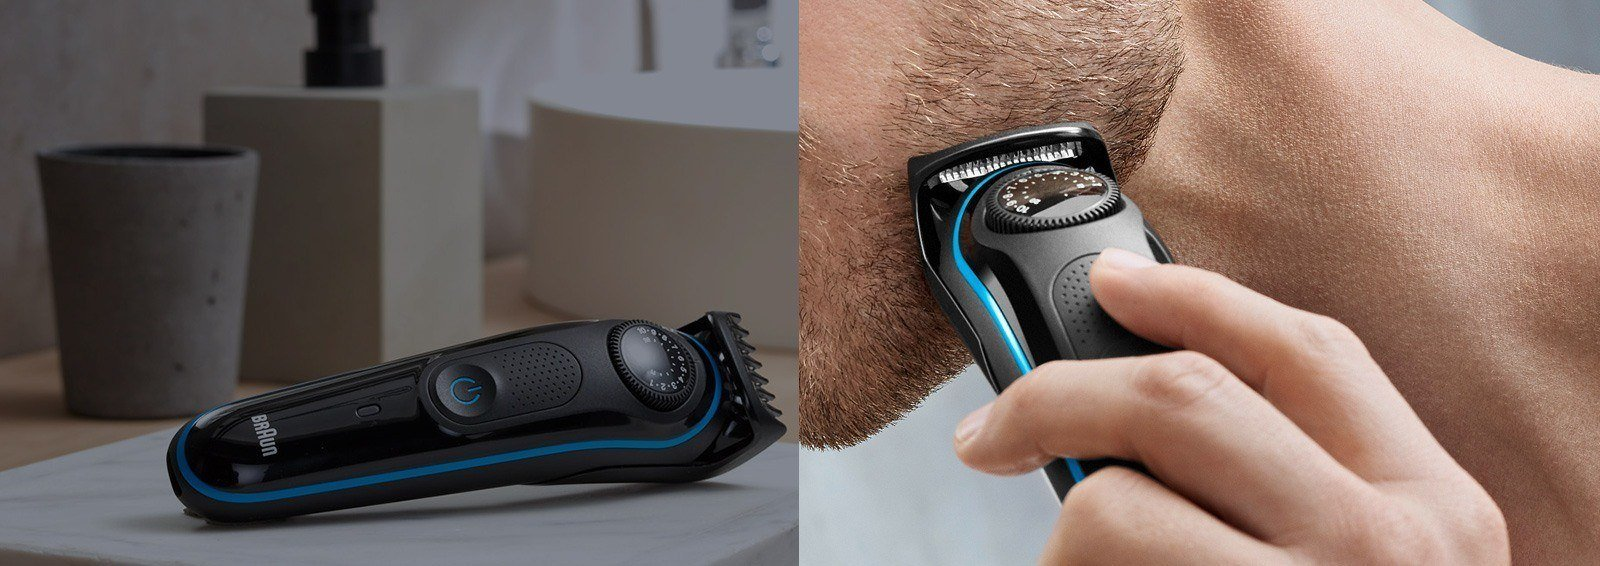 most adjustable beard trimmer